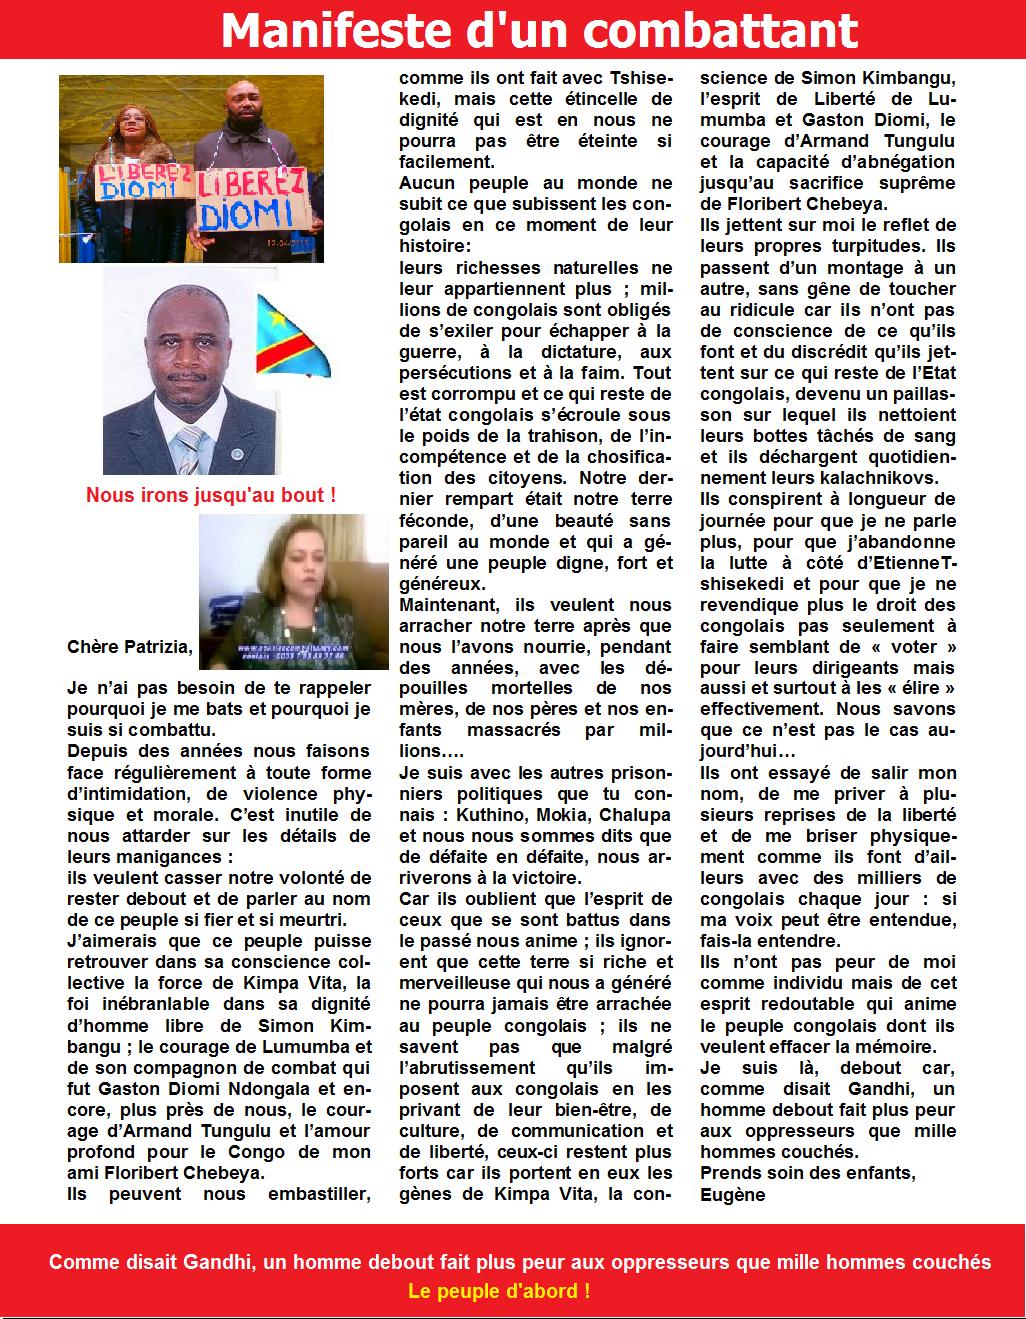 DIOMI NDONGALA:MANIFESTE D'UN COMBATTANT